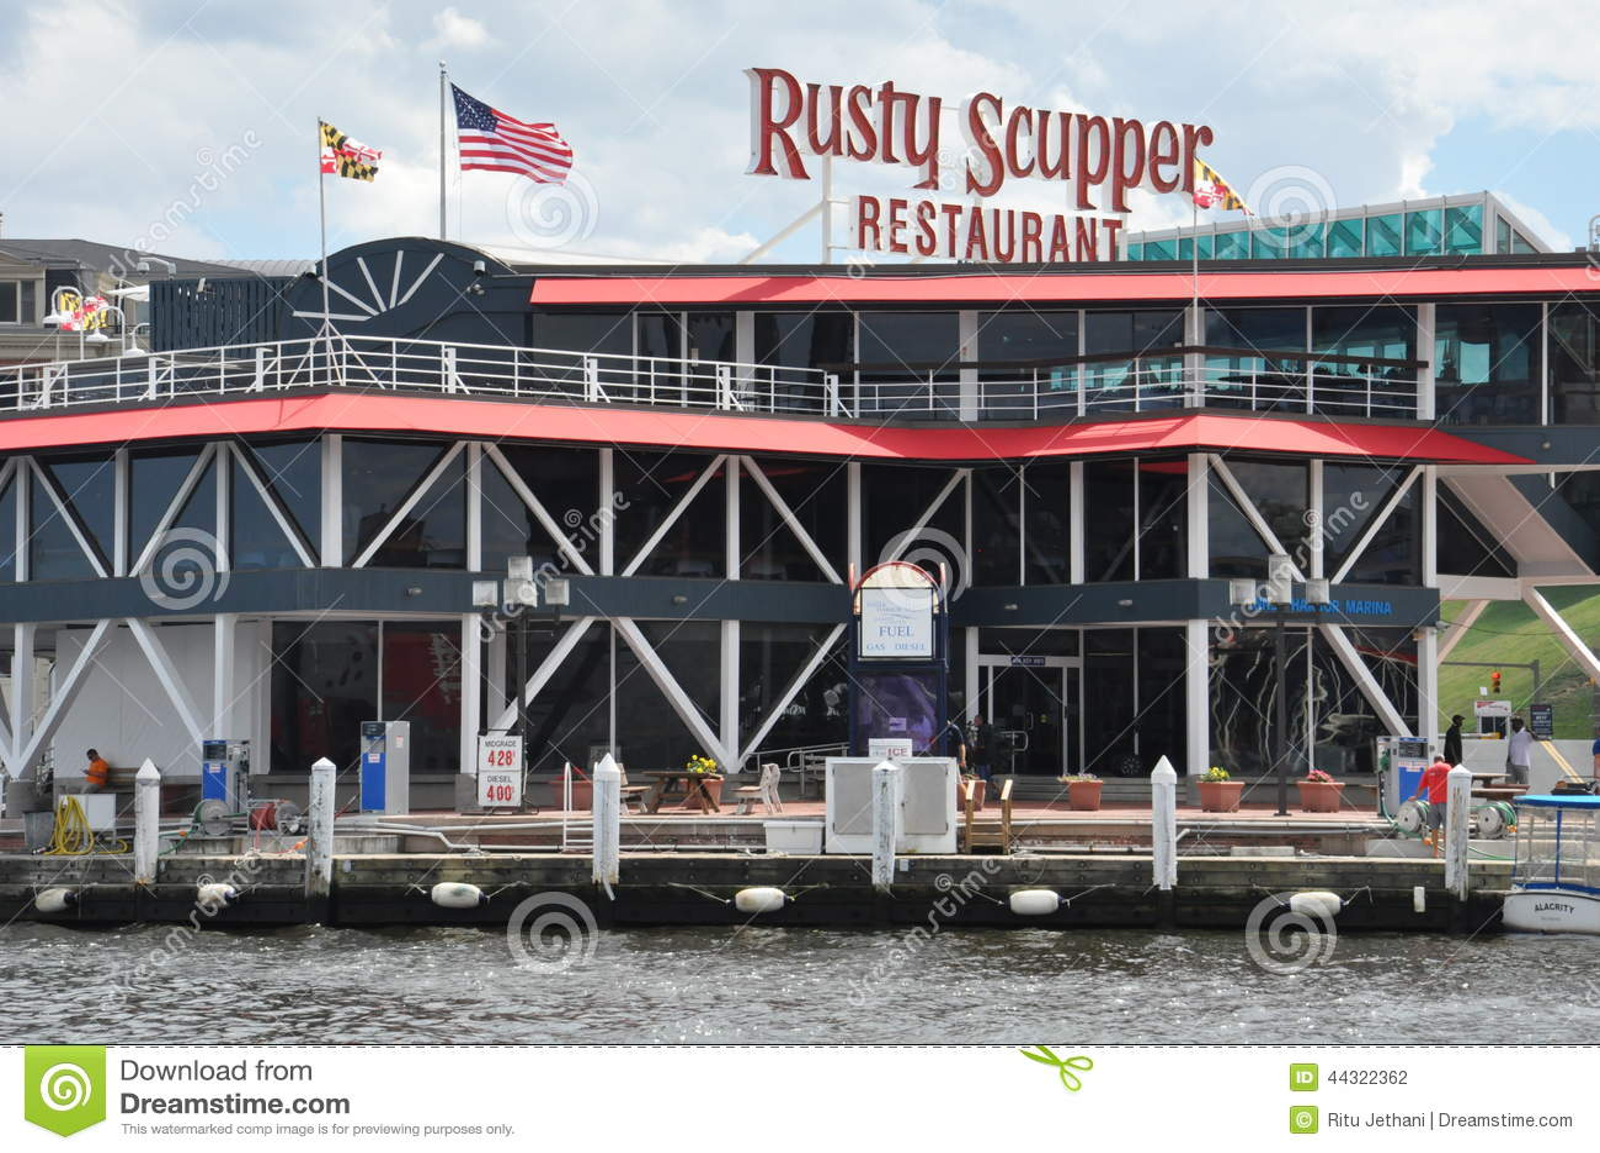 Rusty Scupper Restaurant Amp Bar At The Inner Harbor In